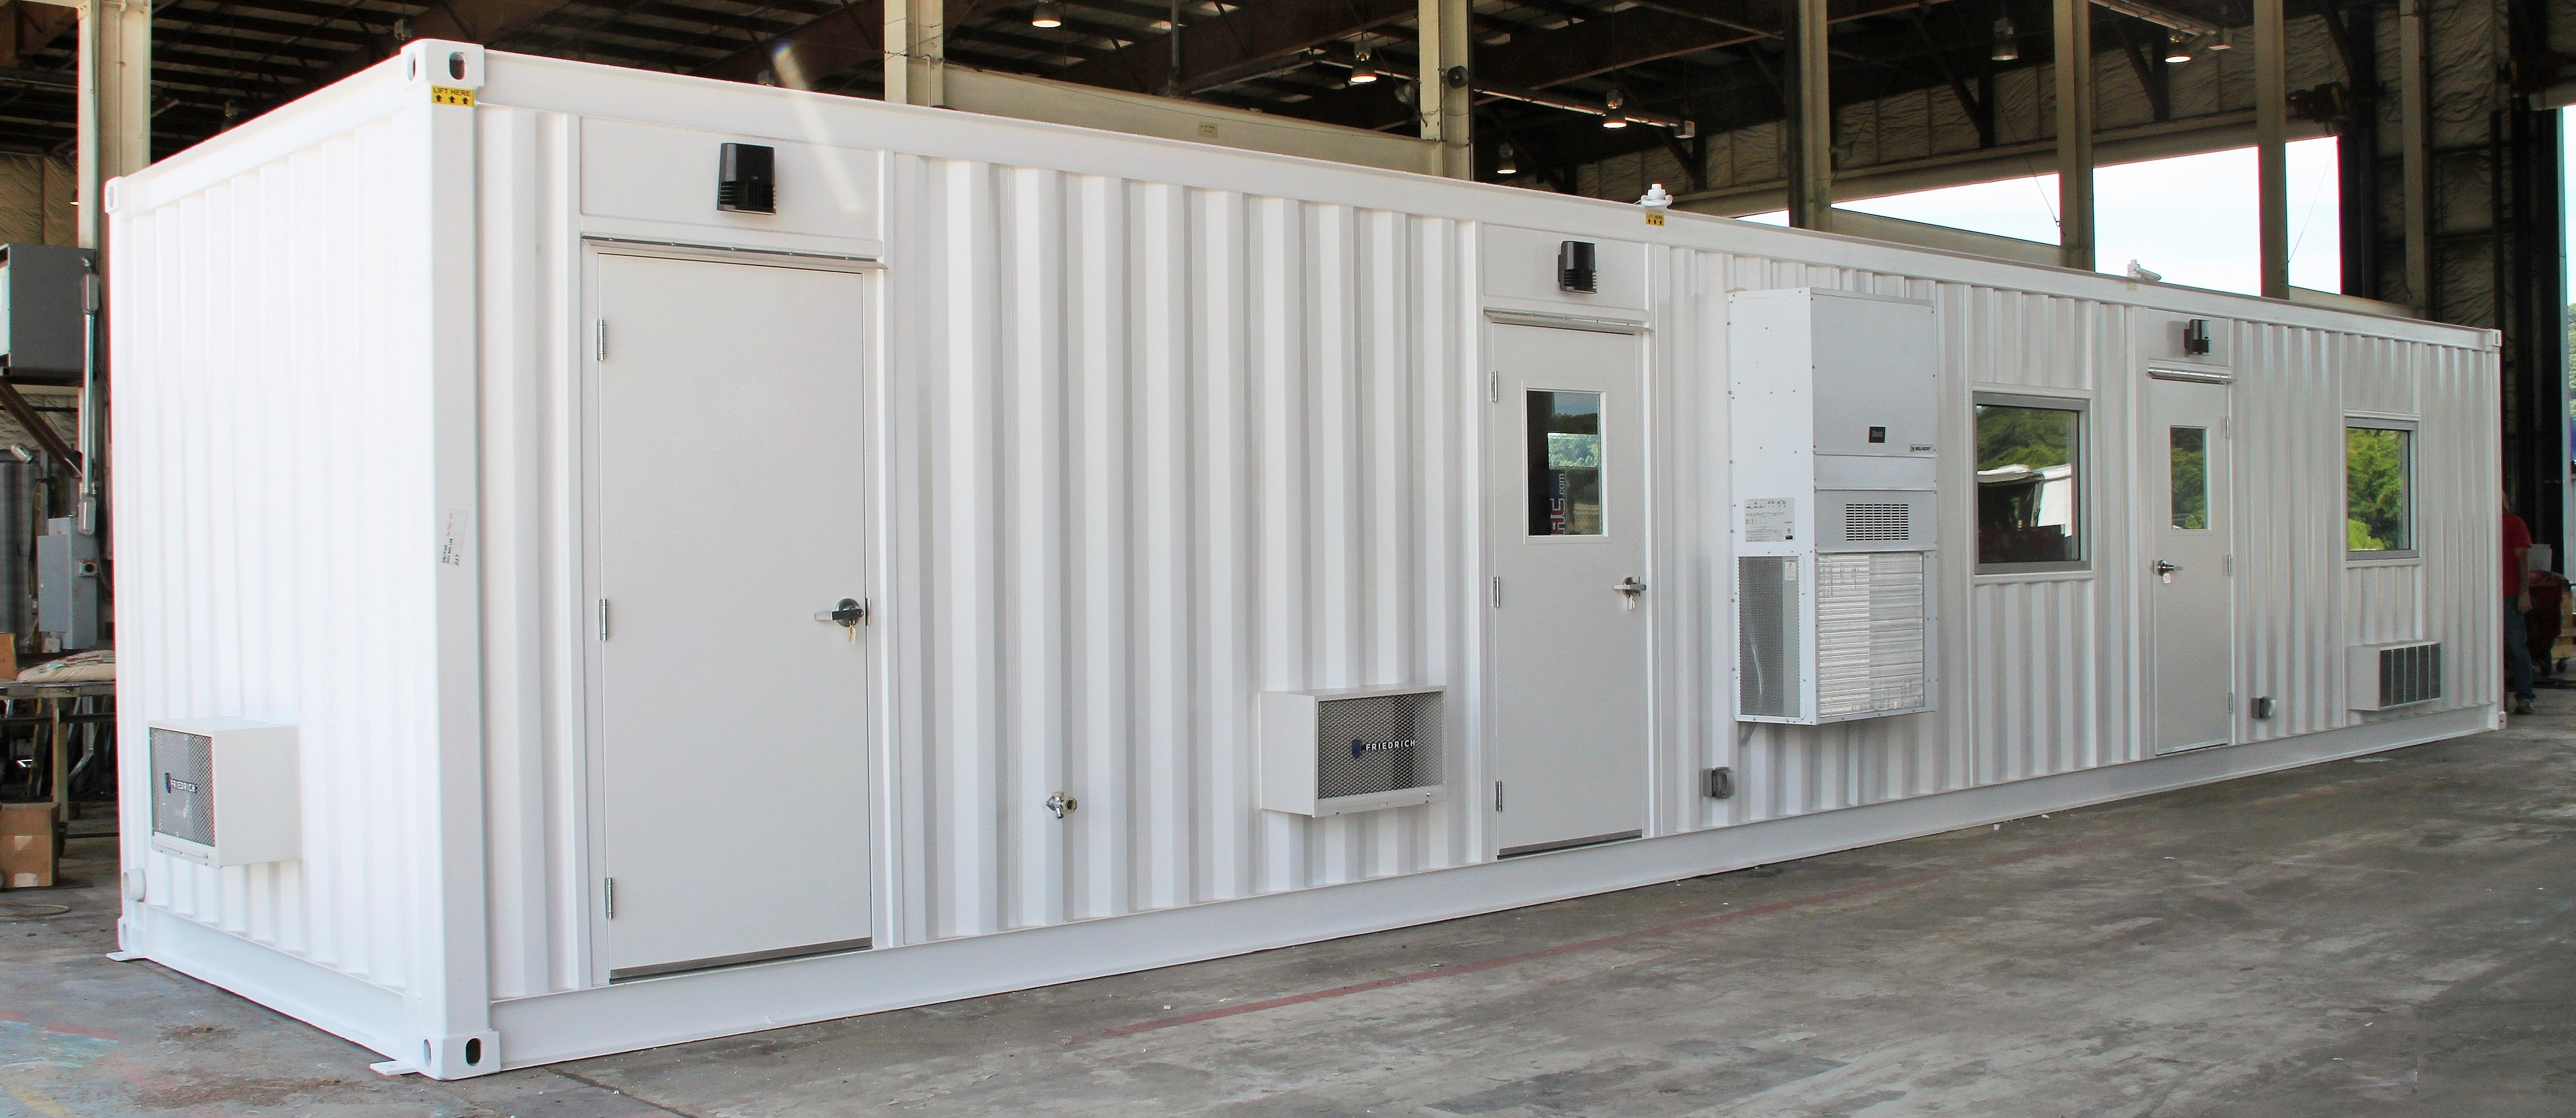 DropBox Inc, ISO Shipping container, shipping container modifications, Shipping container, ISO shipping container modification, modular lab, modular laboratory, mobile laboratory, modular chemical lab, hemp